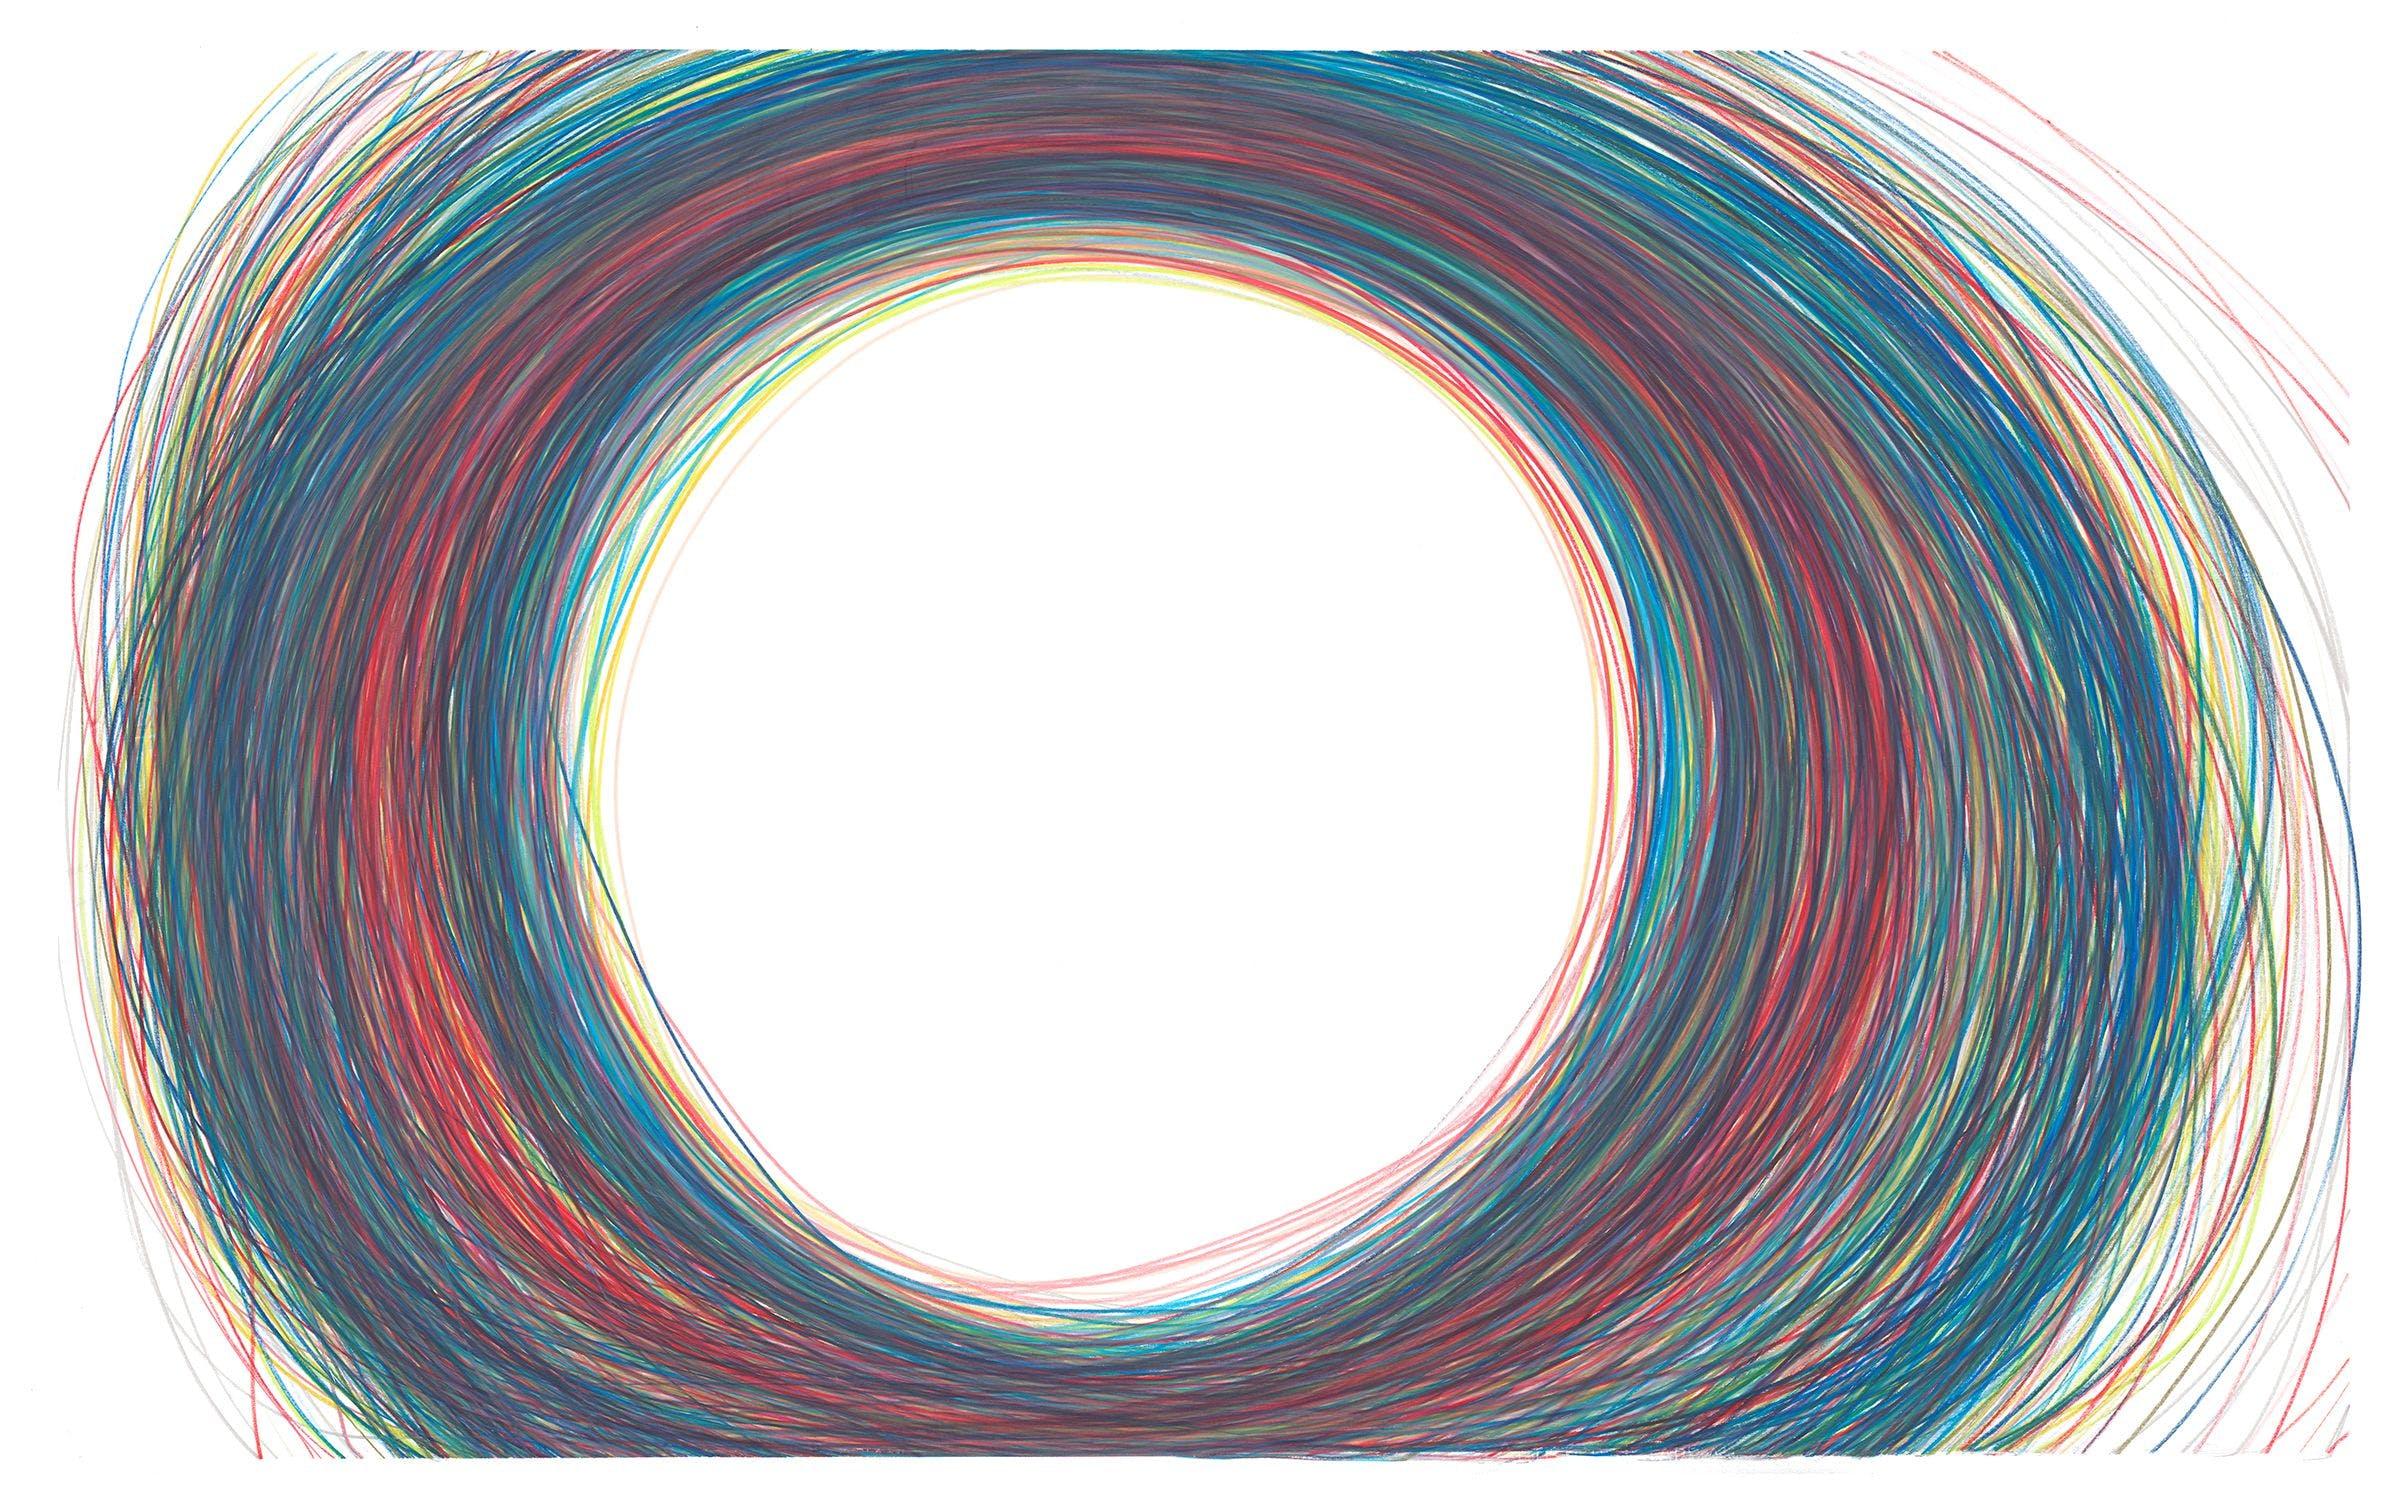 13 coloured pencils to dust (facsimile) 2018–2019 Coloured Caran d'Ache Luminance pencils on Fabriano Artistico paper, 161×99cm